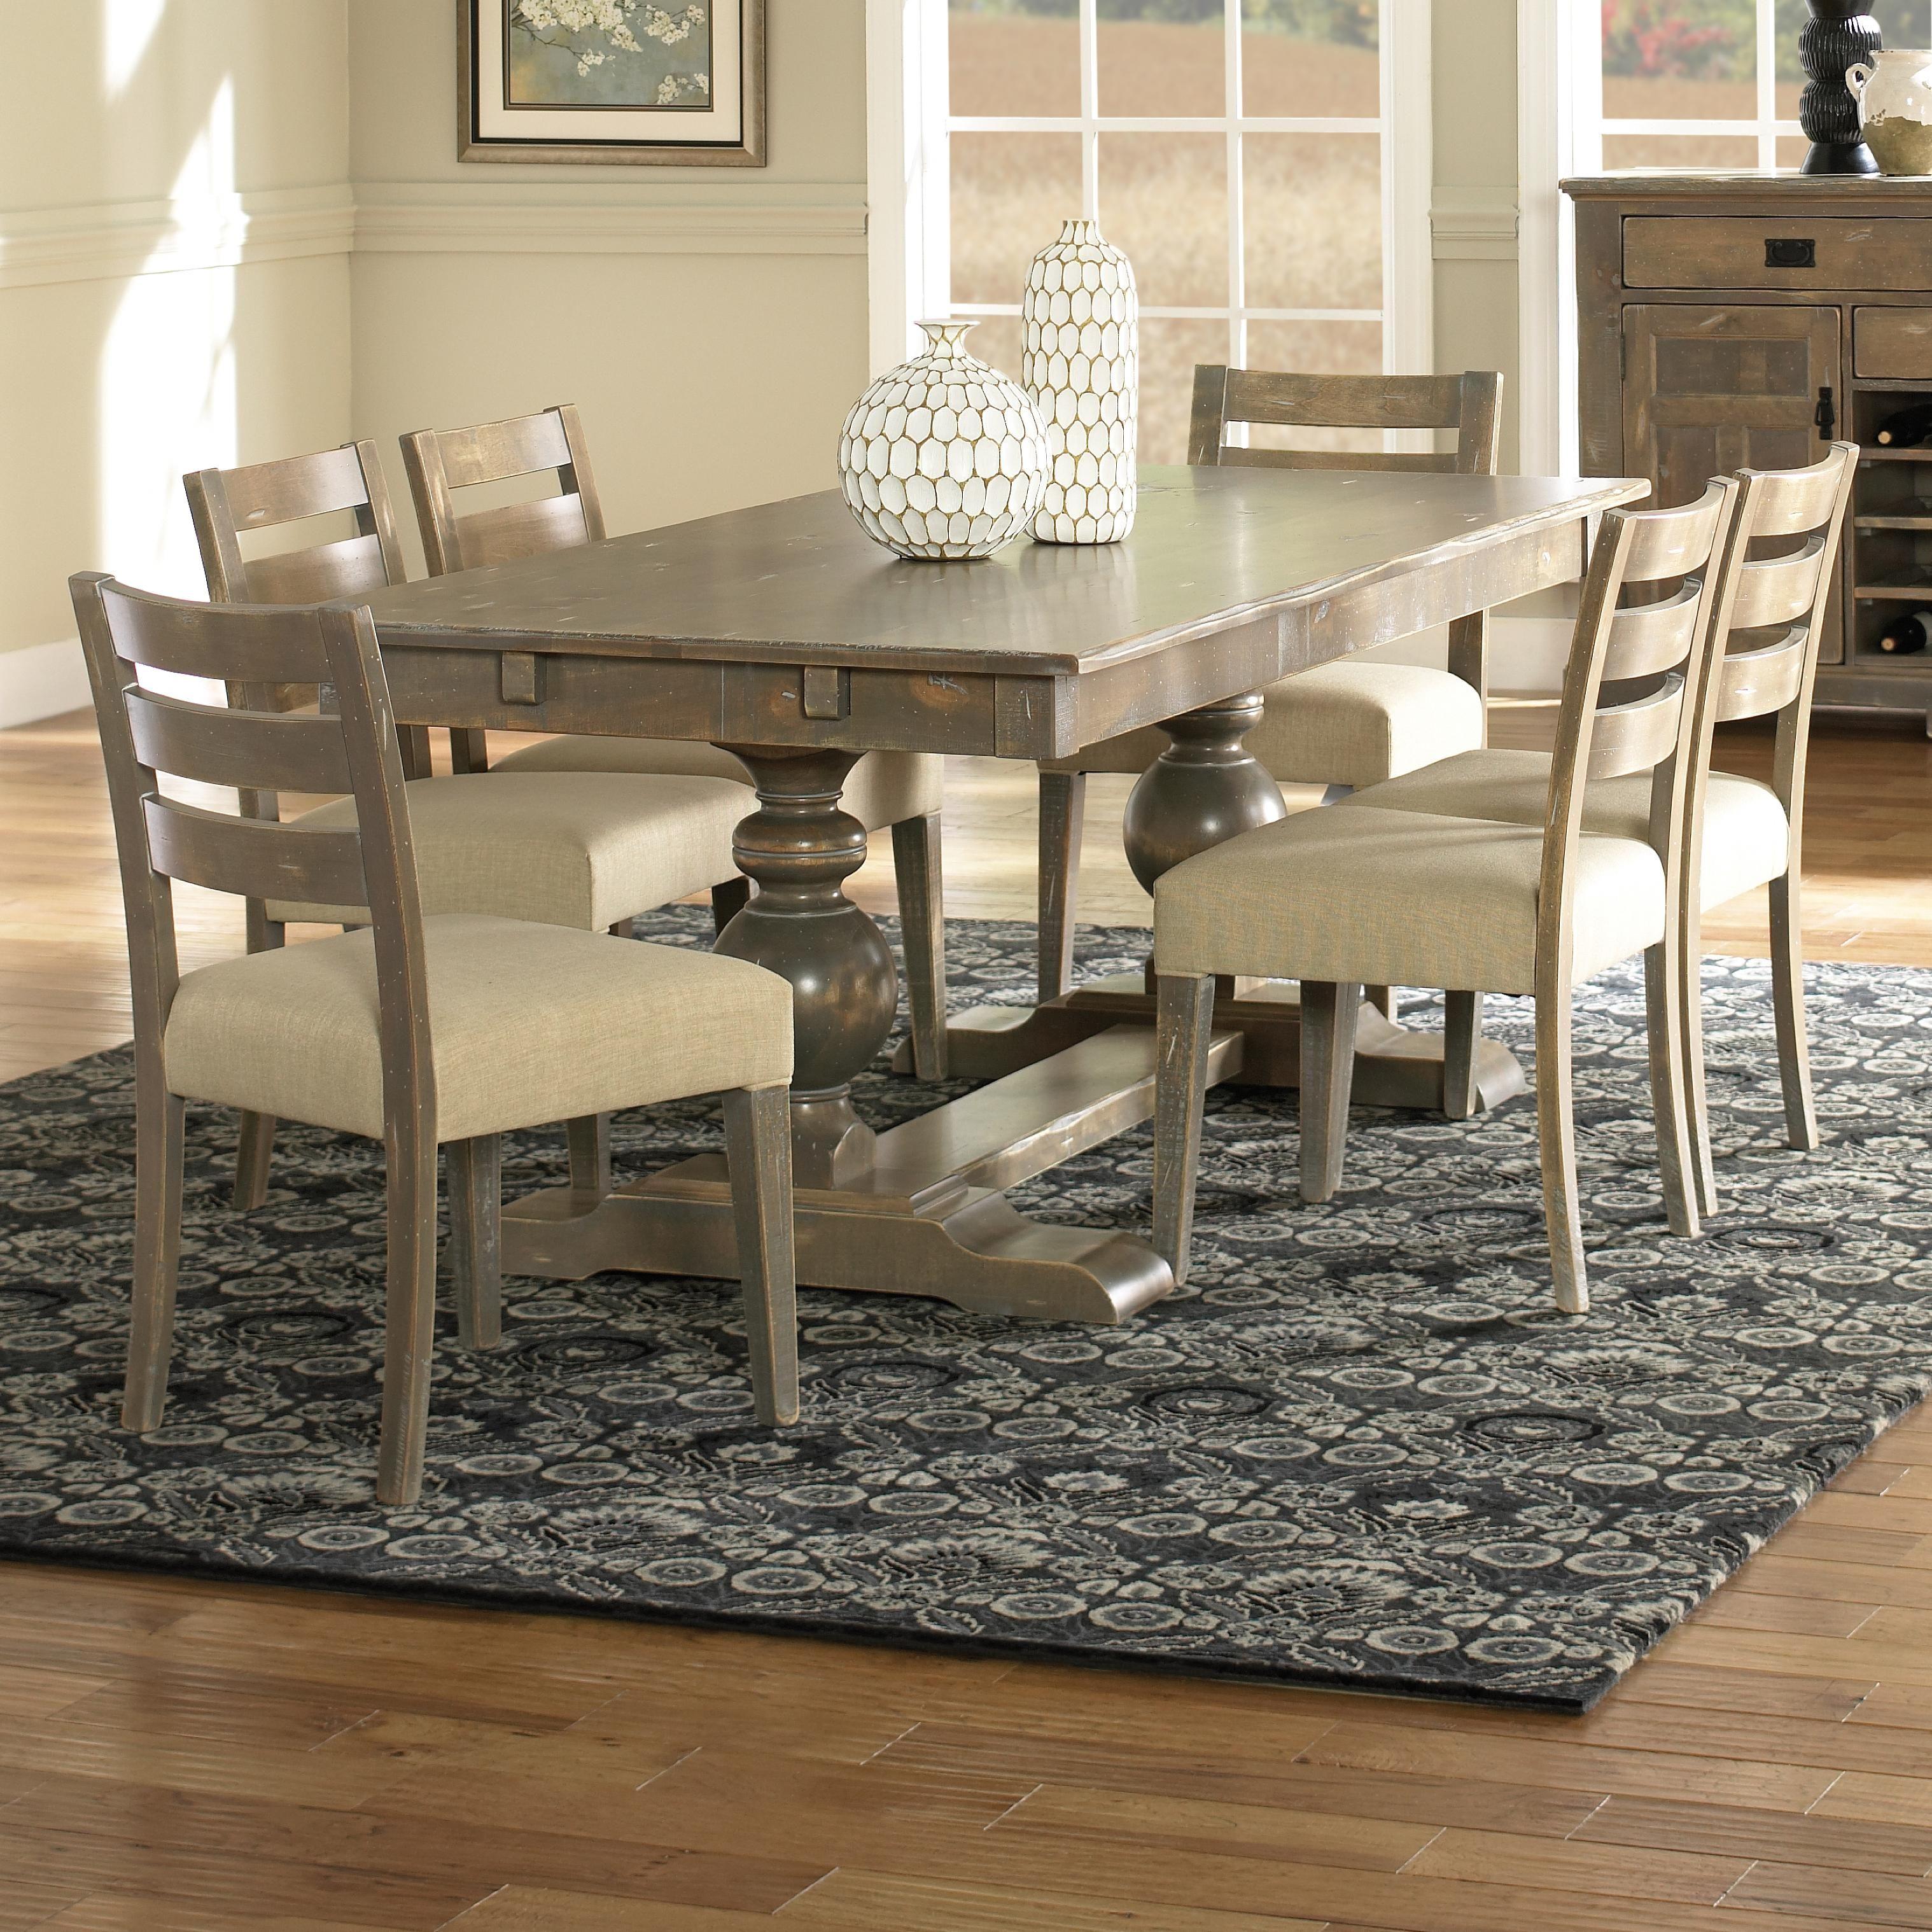 Champlain Custom Dining b Customizable b Rectangular Table Set